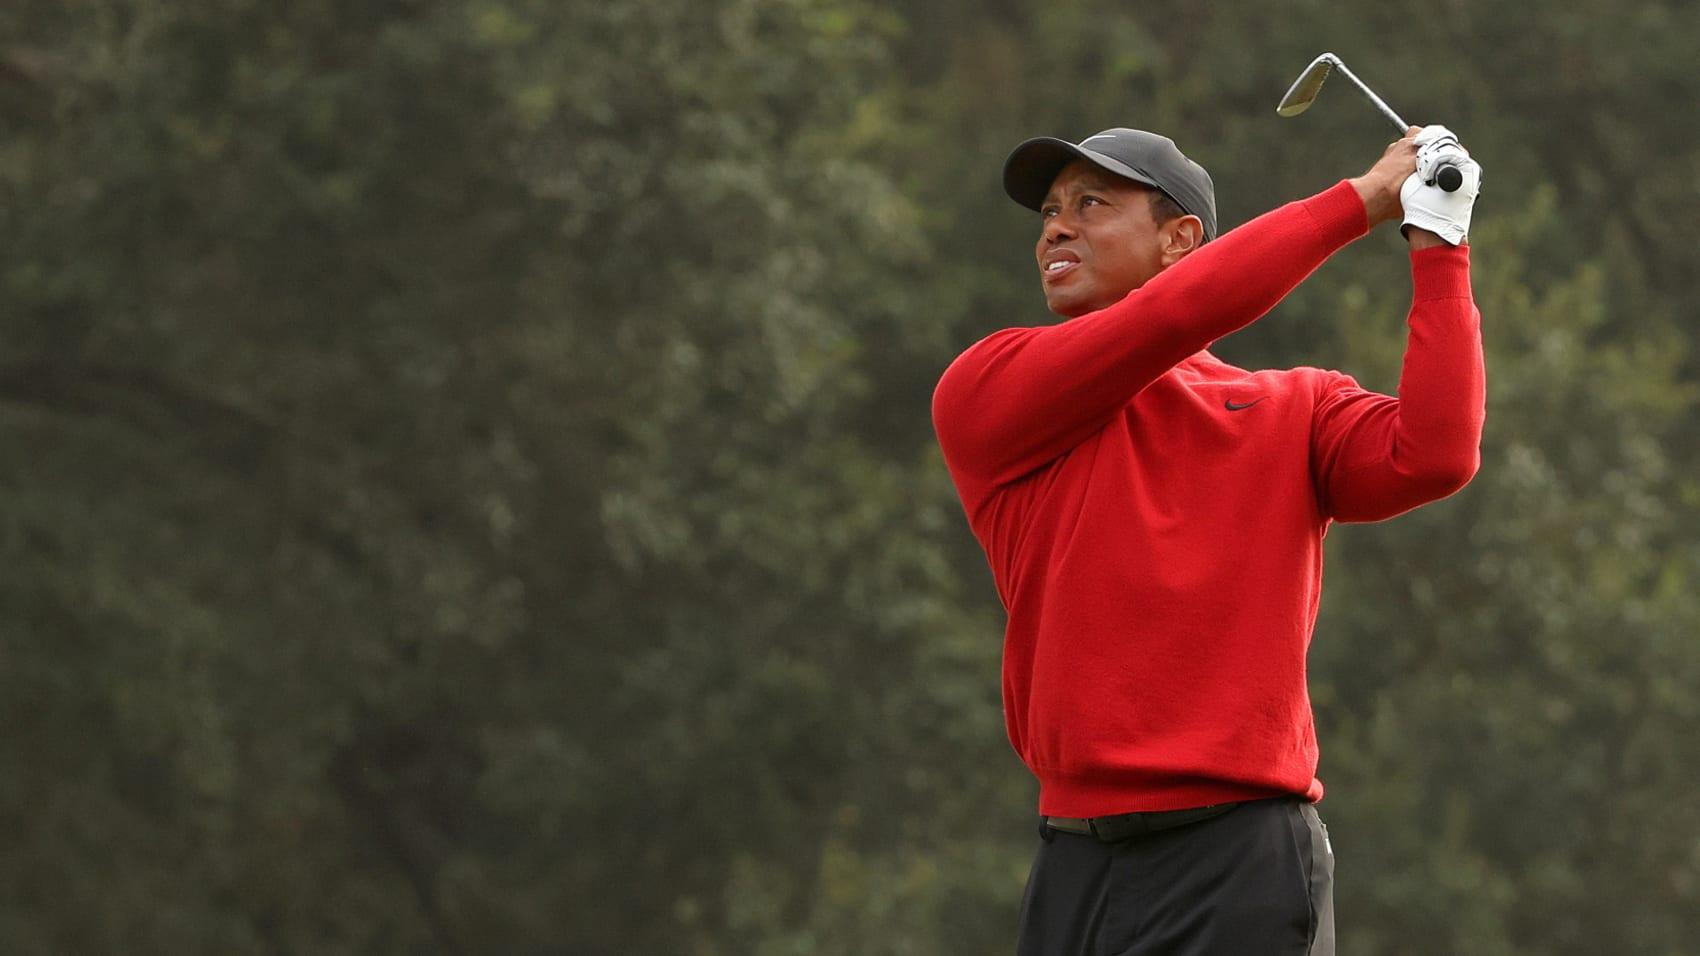 tiger swing 1694 getty - Tiger Woods aus dem Krankenhaus entlassen